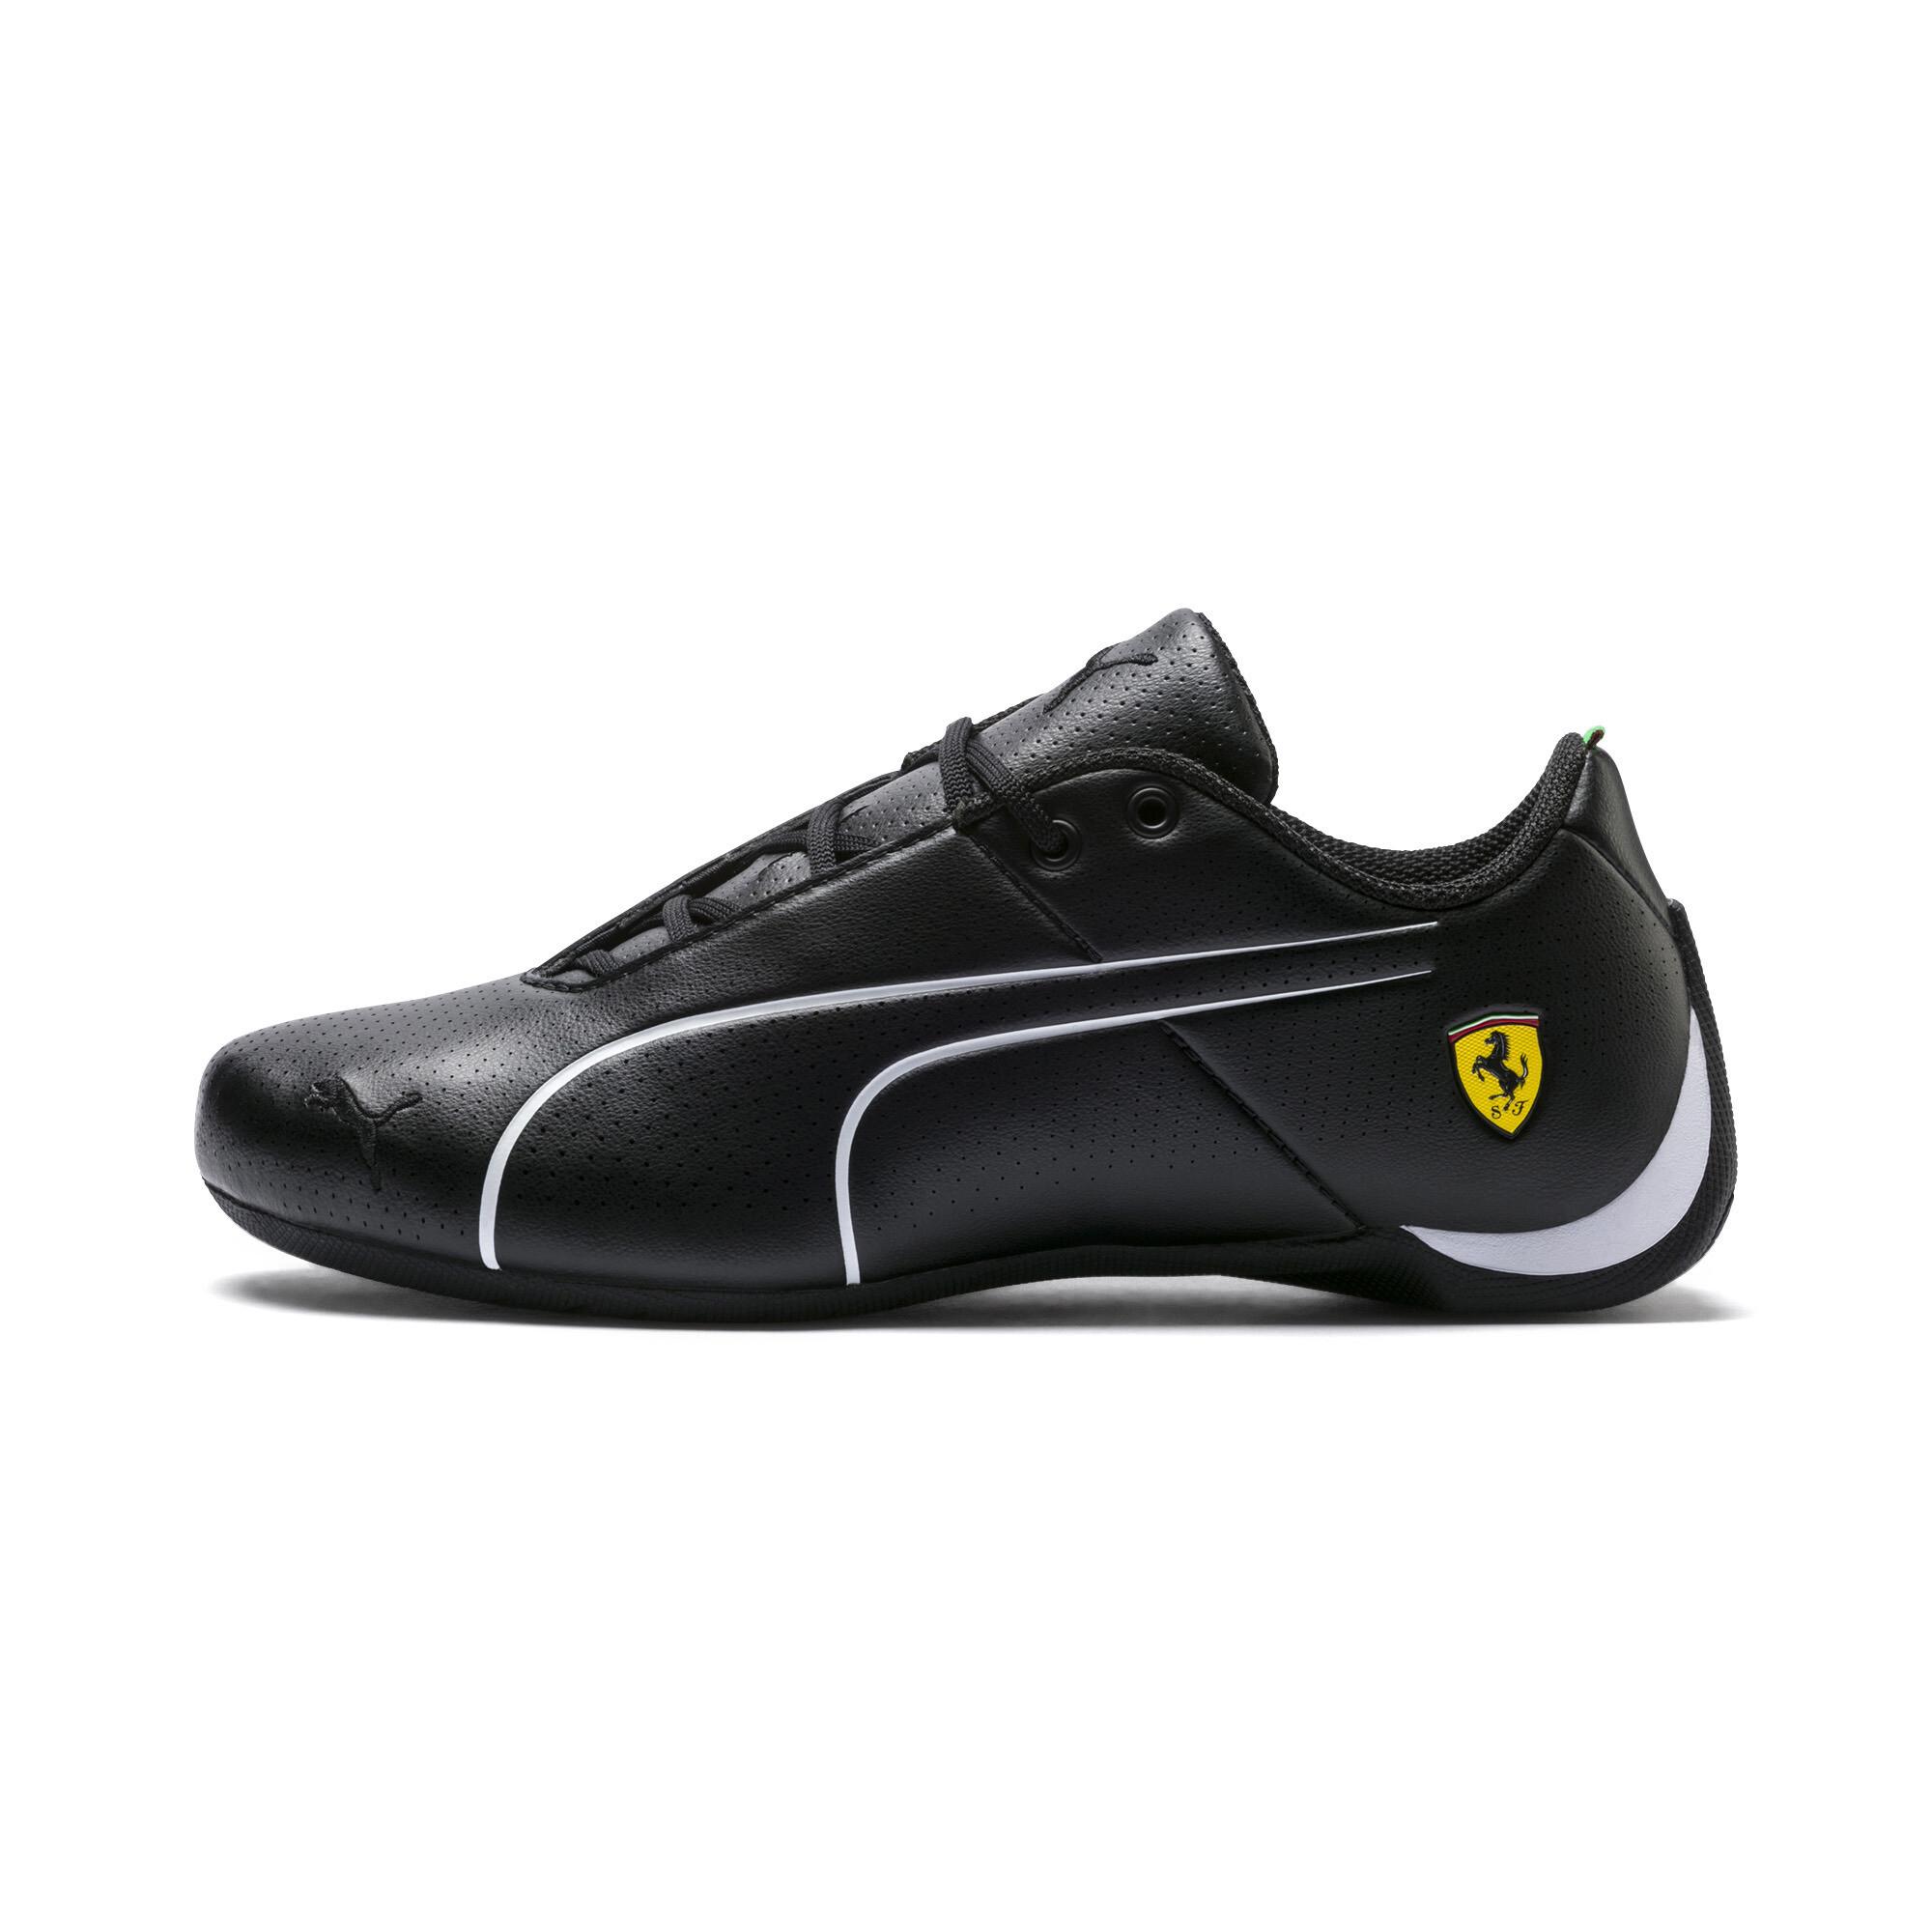 0823e4cd0 Zapatillas Ferrari Future Cat Ultra para niños